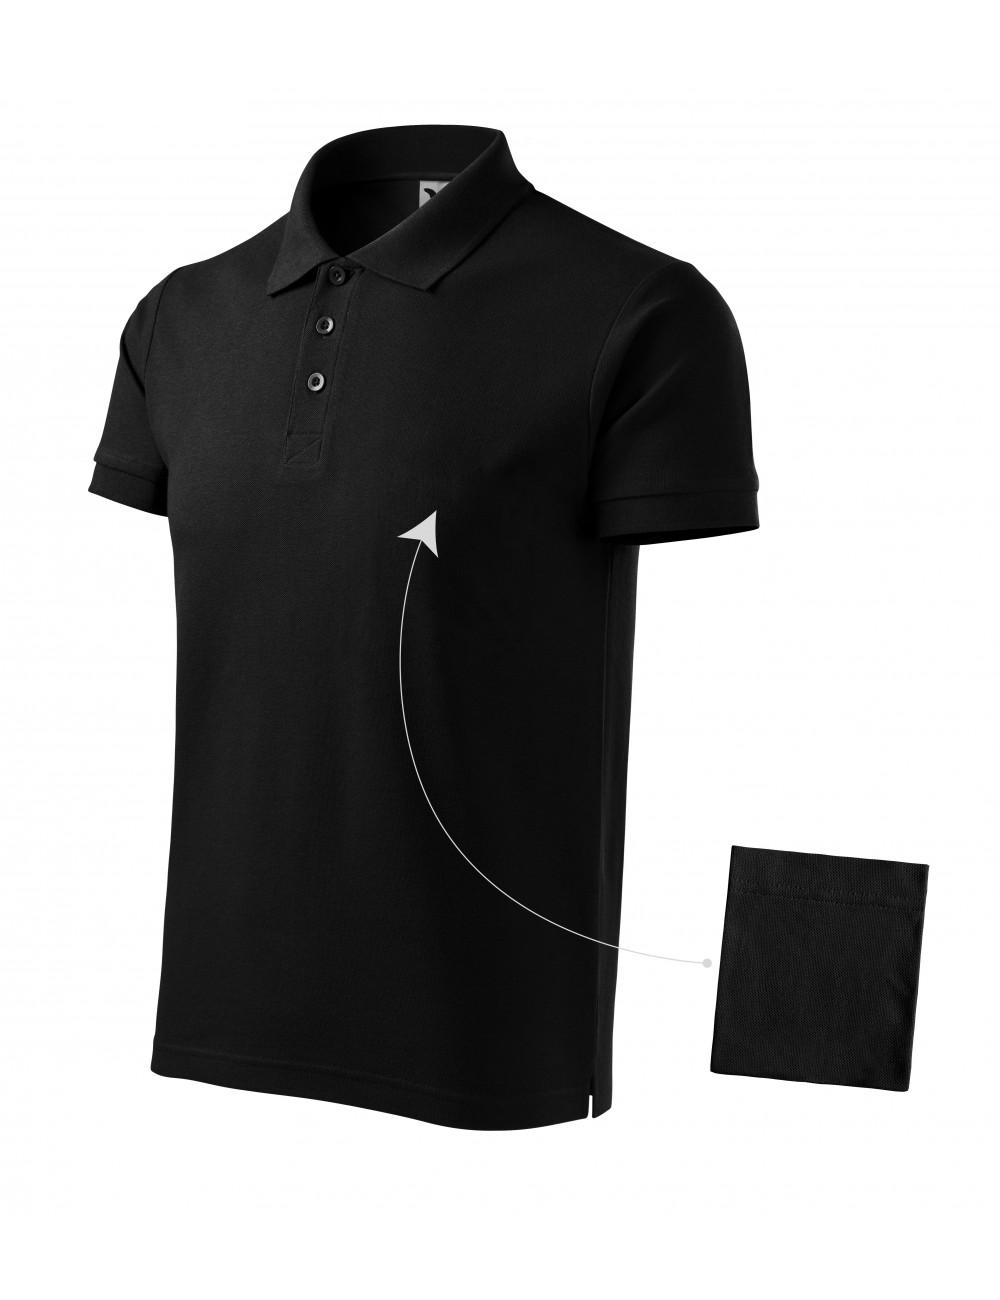 Adler MALFINI Koszulka polo męska Cotton 212 czarny